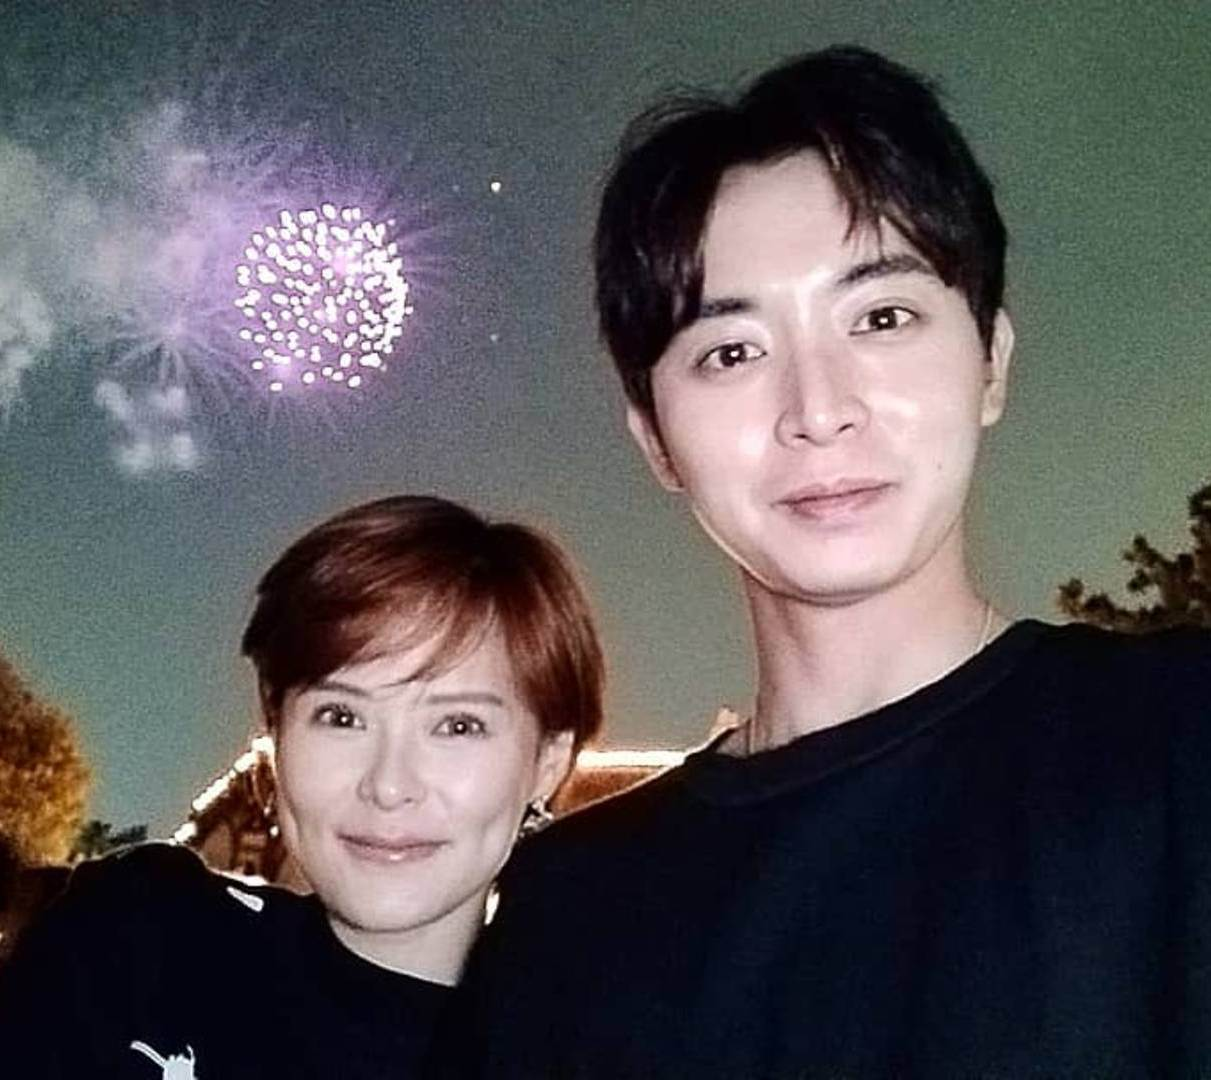 Jayley Woo & Aloysius Pang - Timeless Love